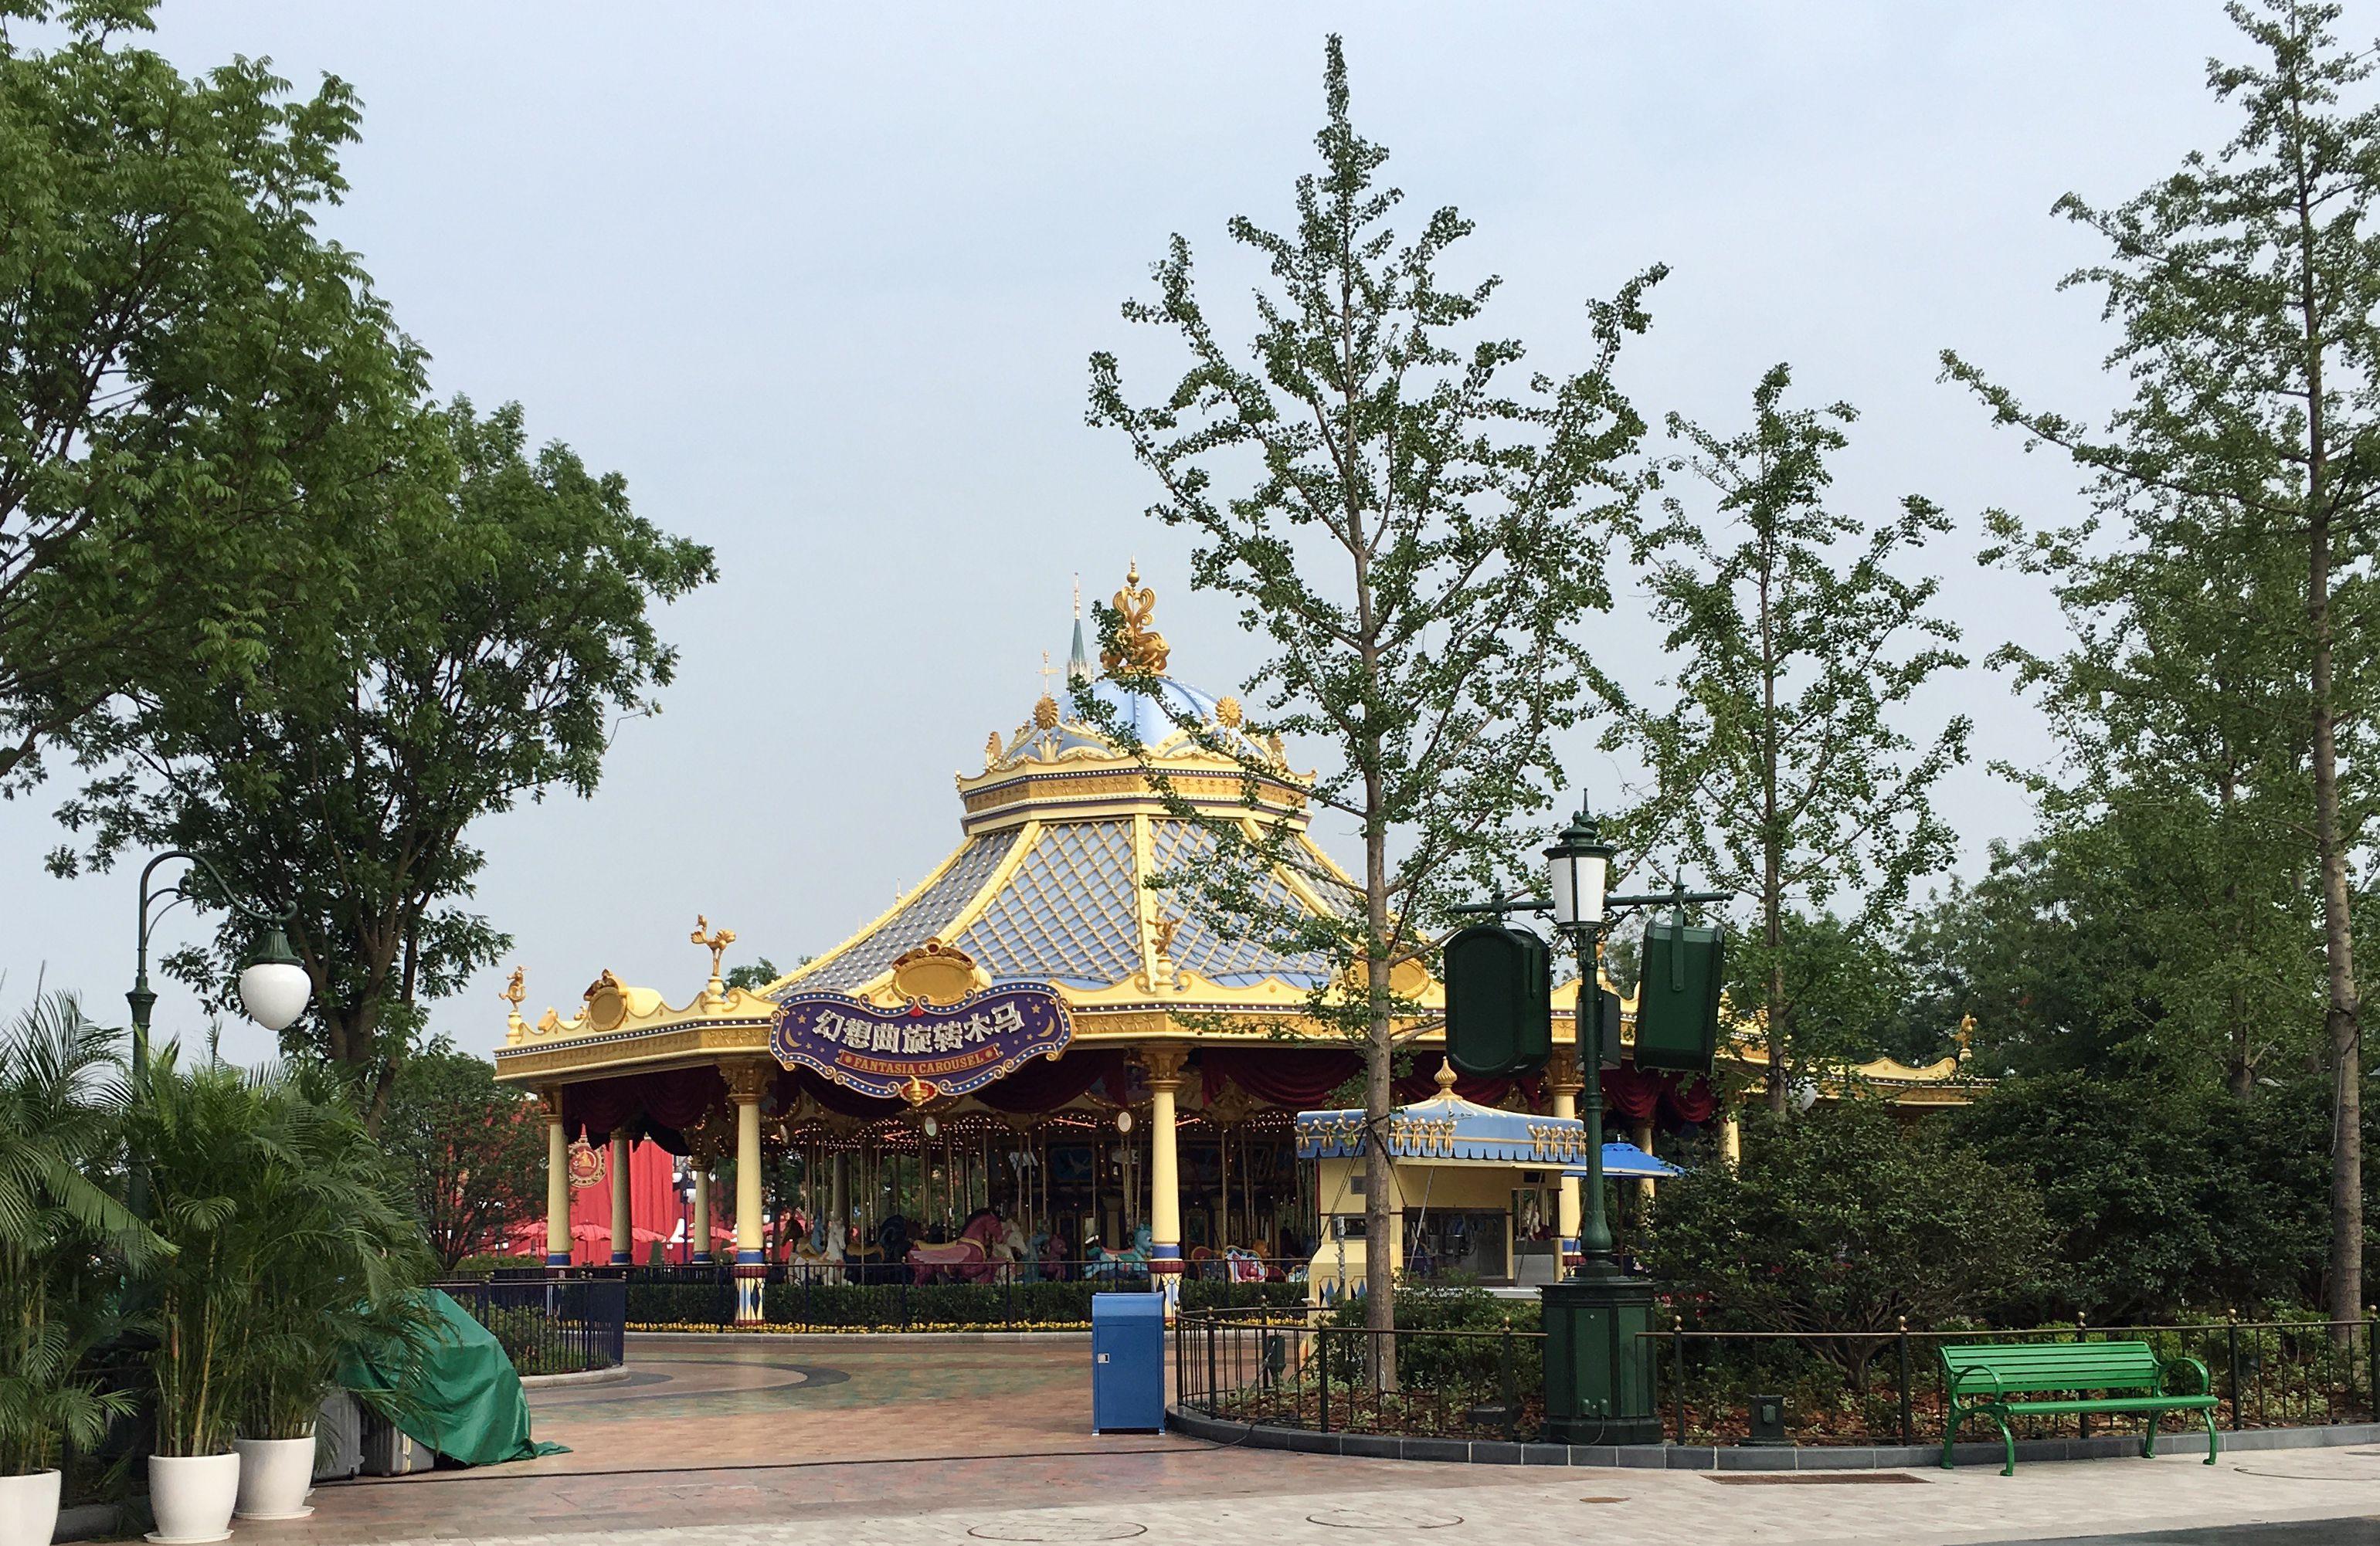 Shanghai Disneyland Gardens of Imagination